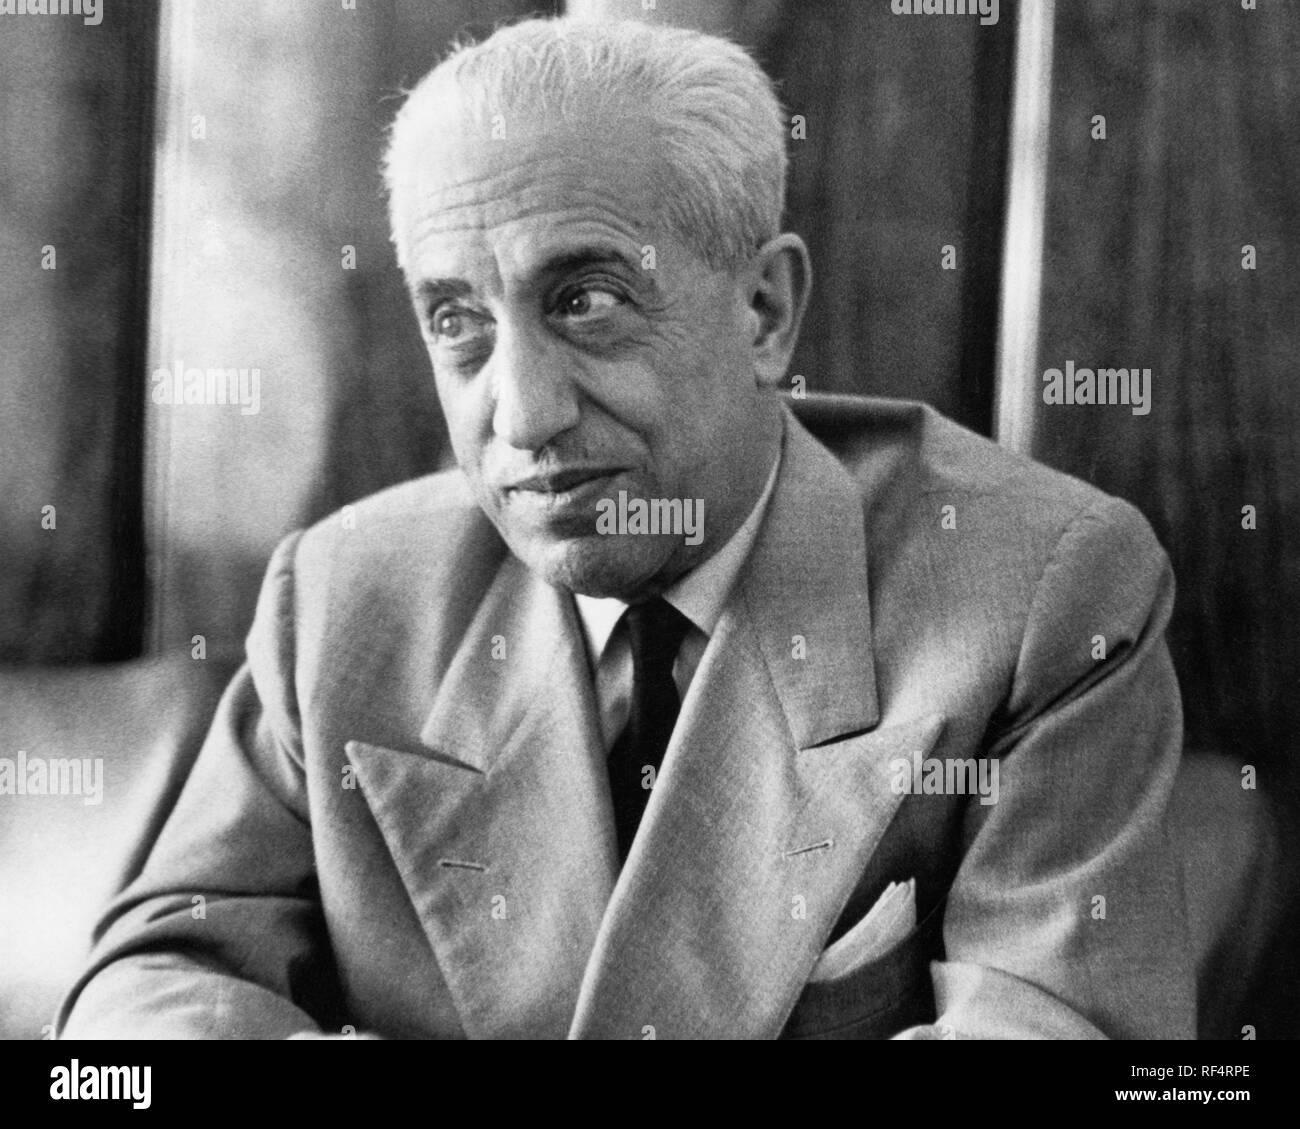 vittorio valletta, president of fiat, 1963 Stock Photo